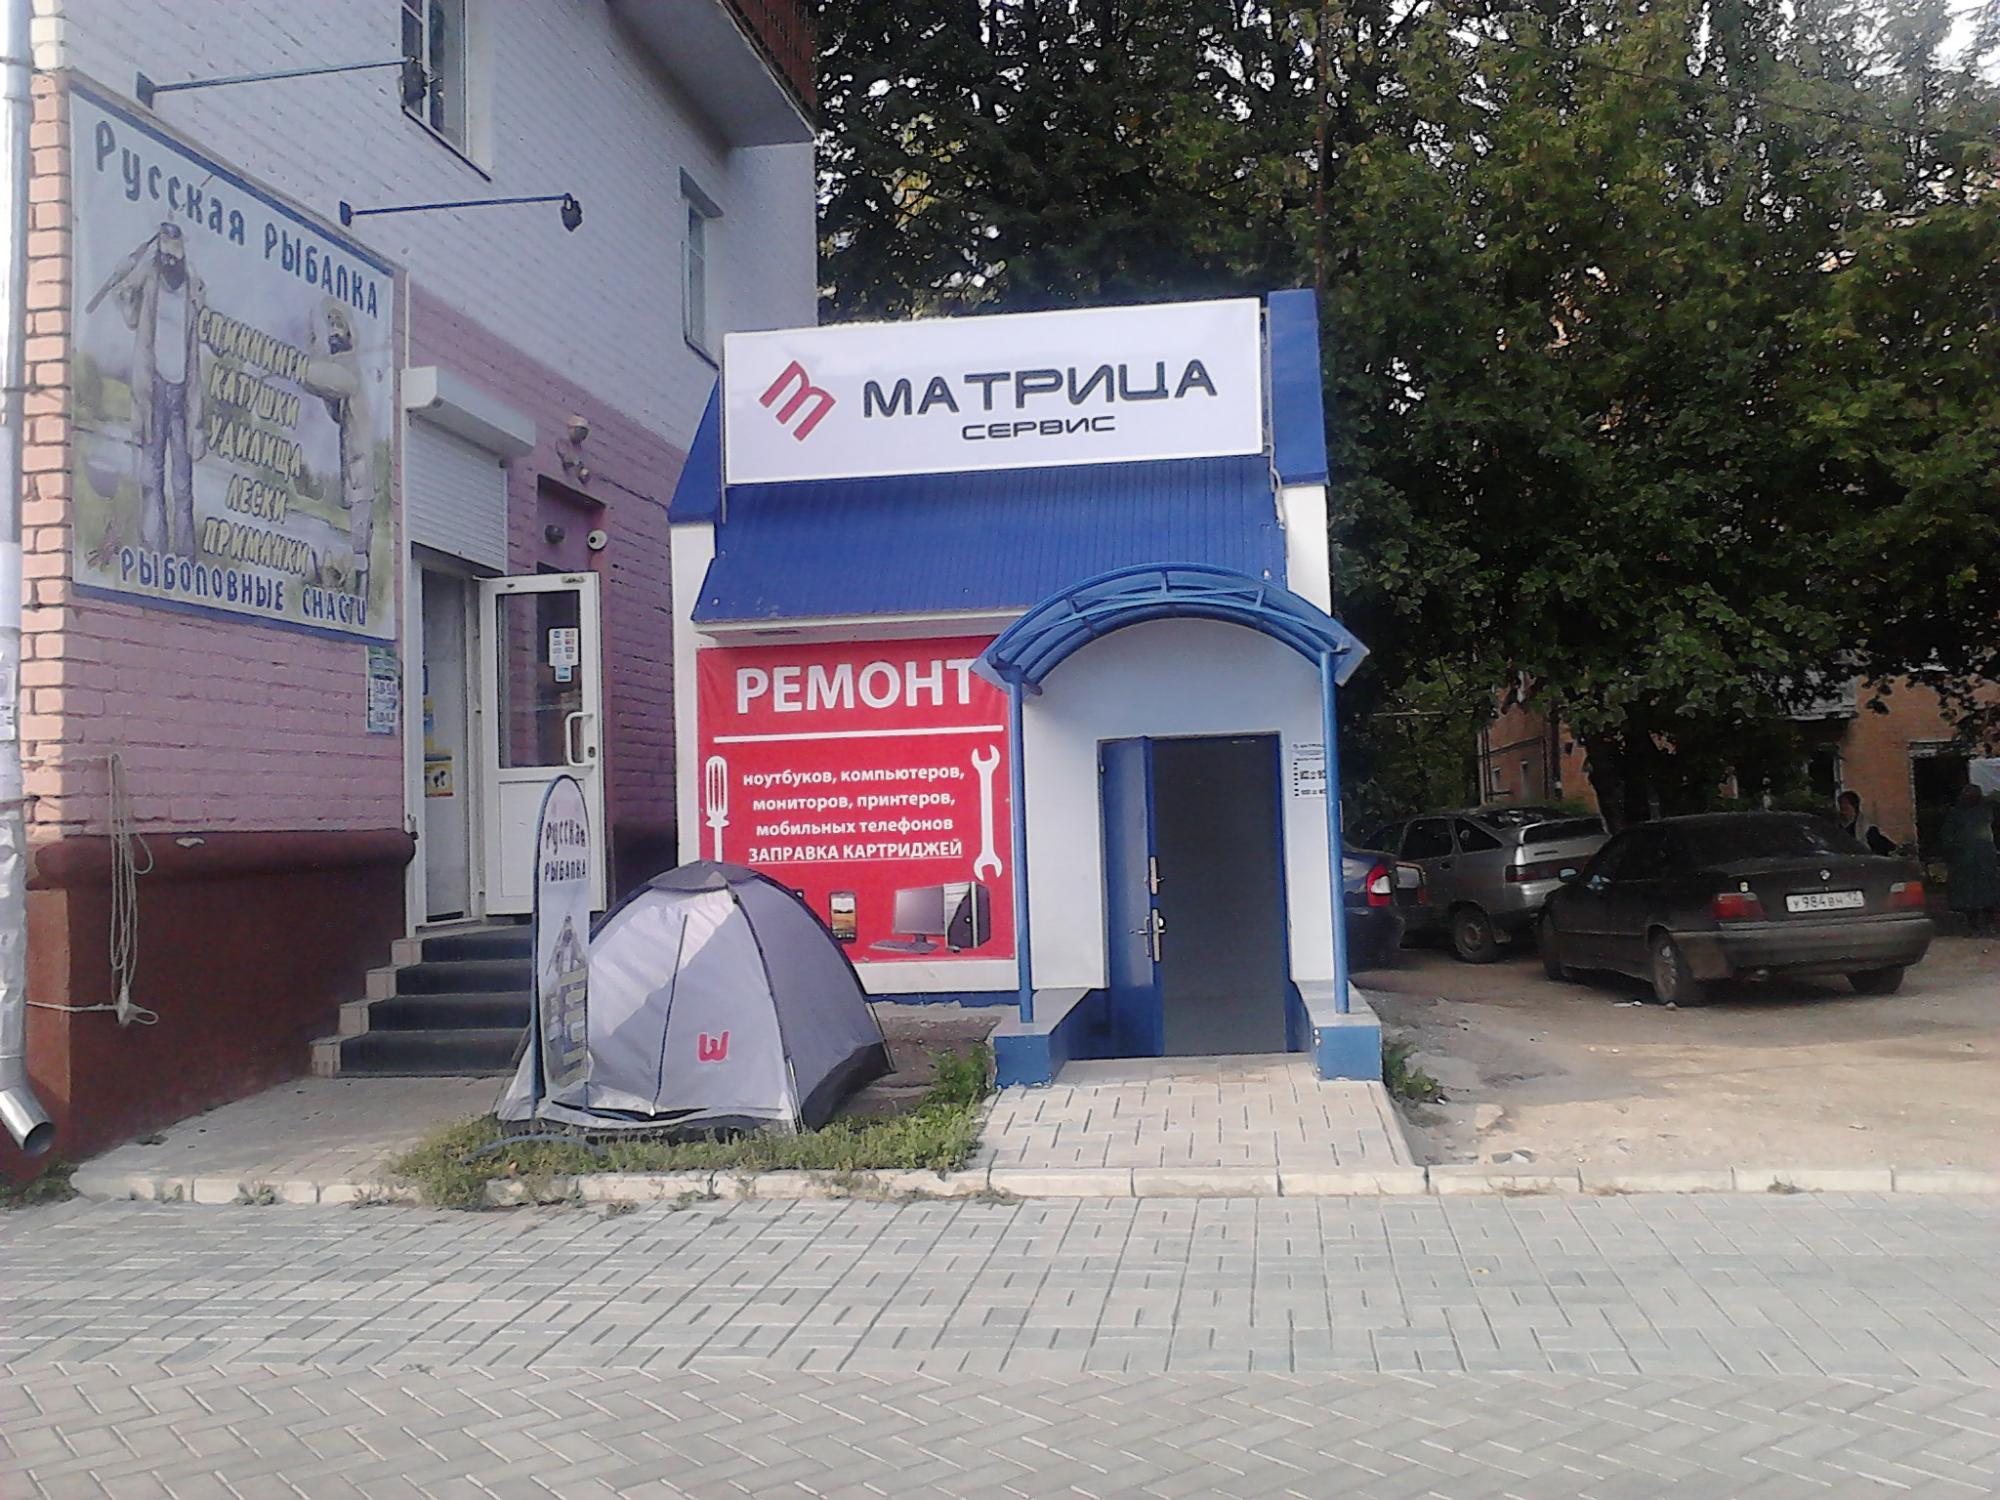 матрица в городе йошкар ола Москве реализуется